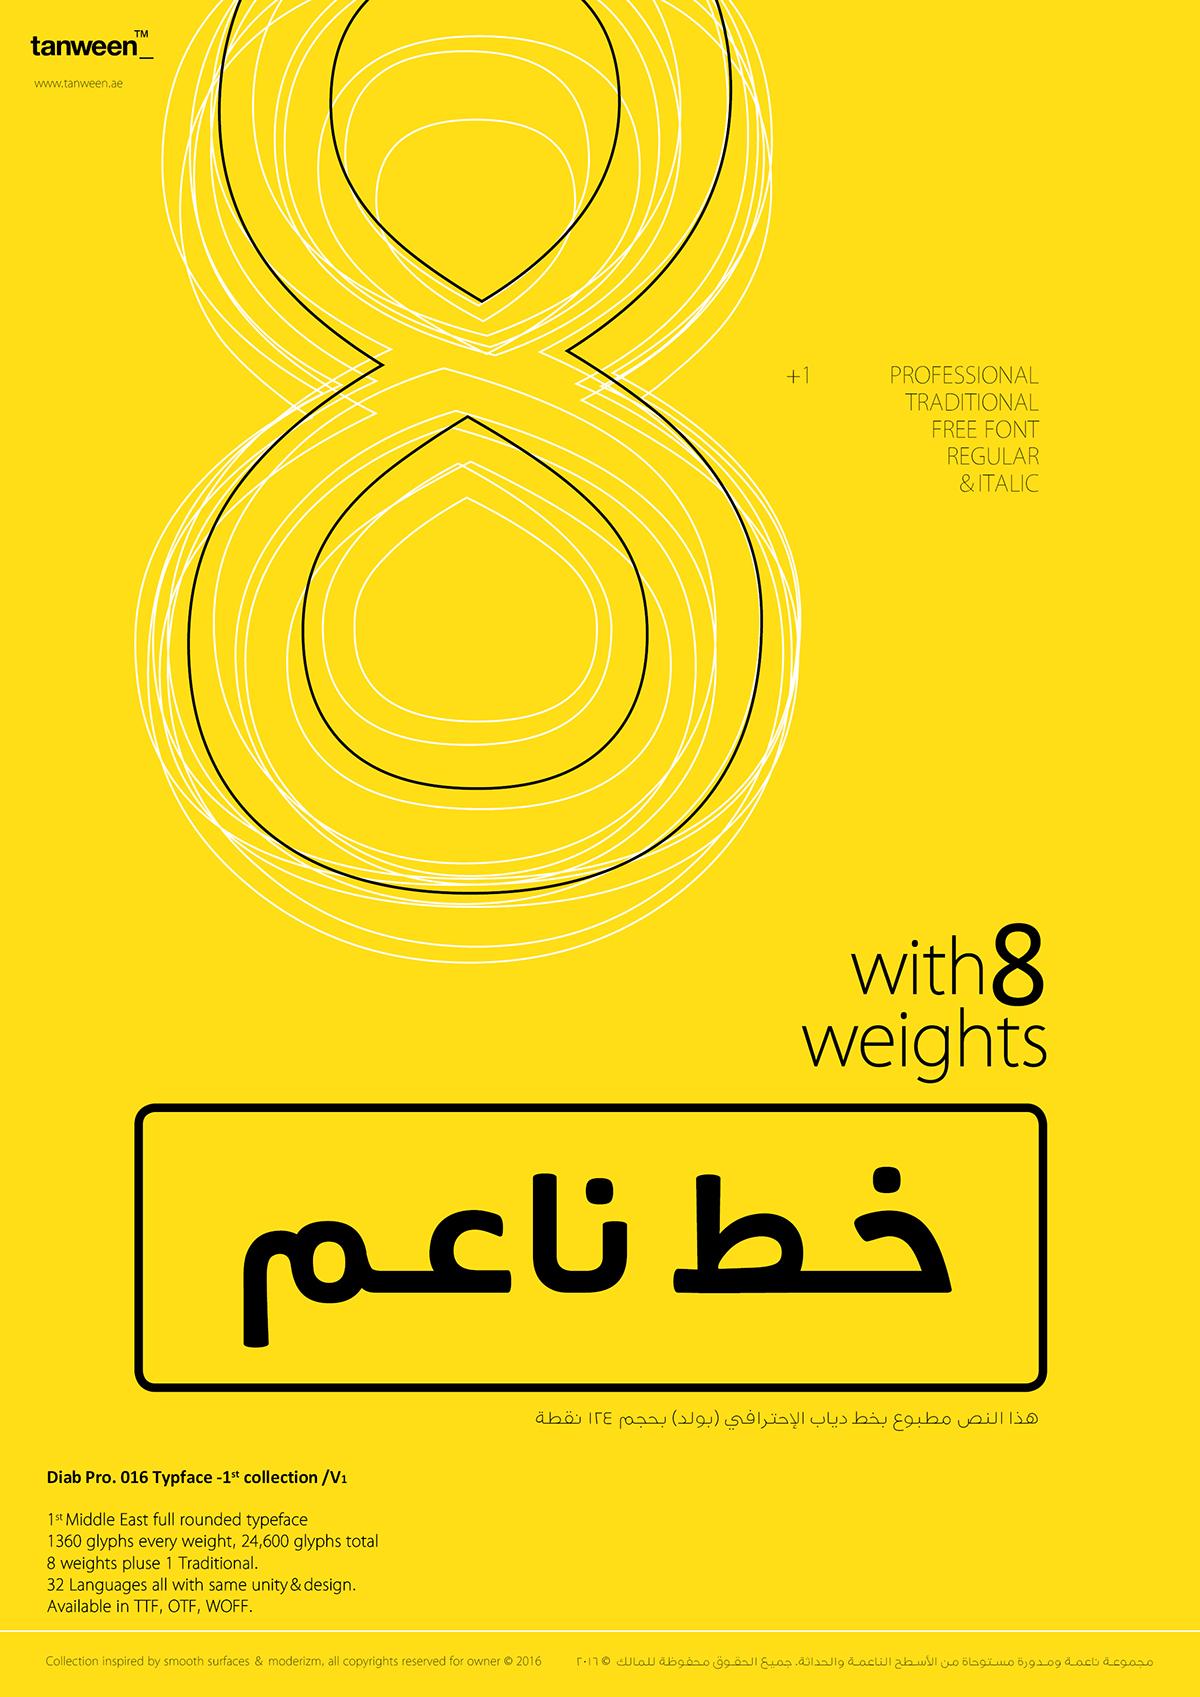 Diab Orient 2018 The Best Arabic Typeface Ever on Behance